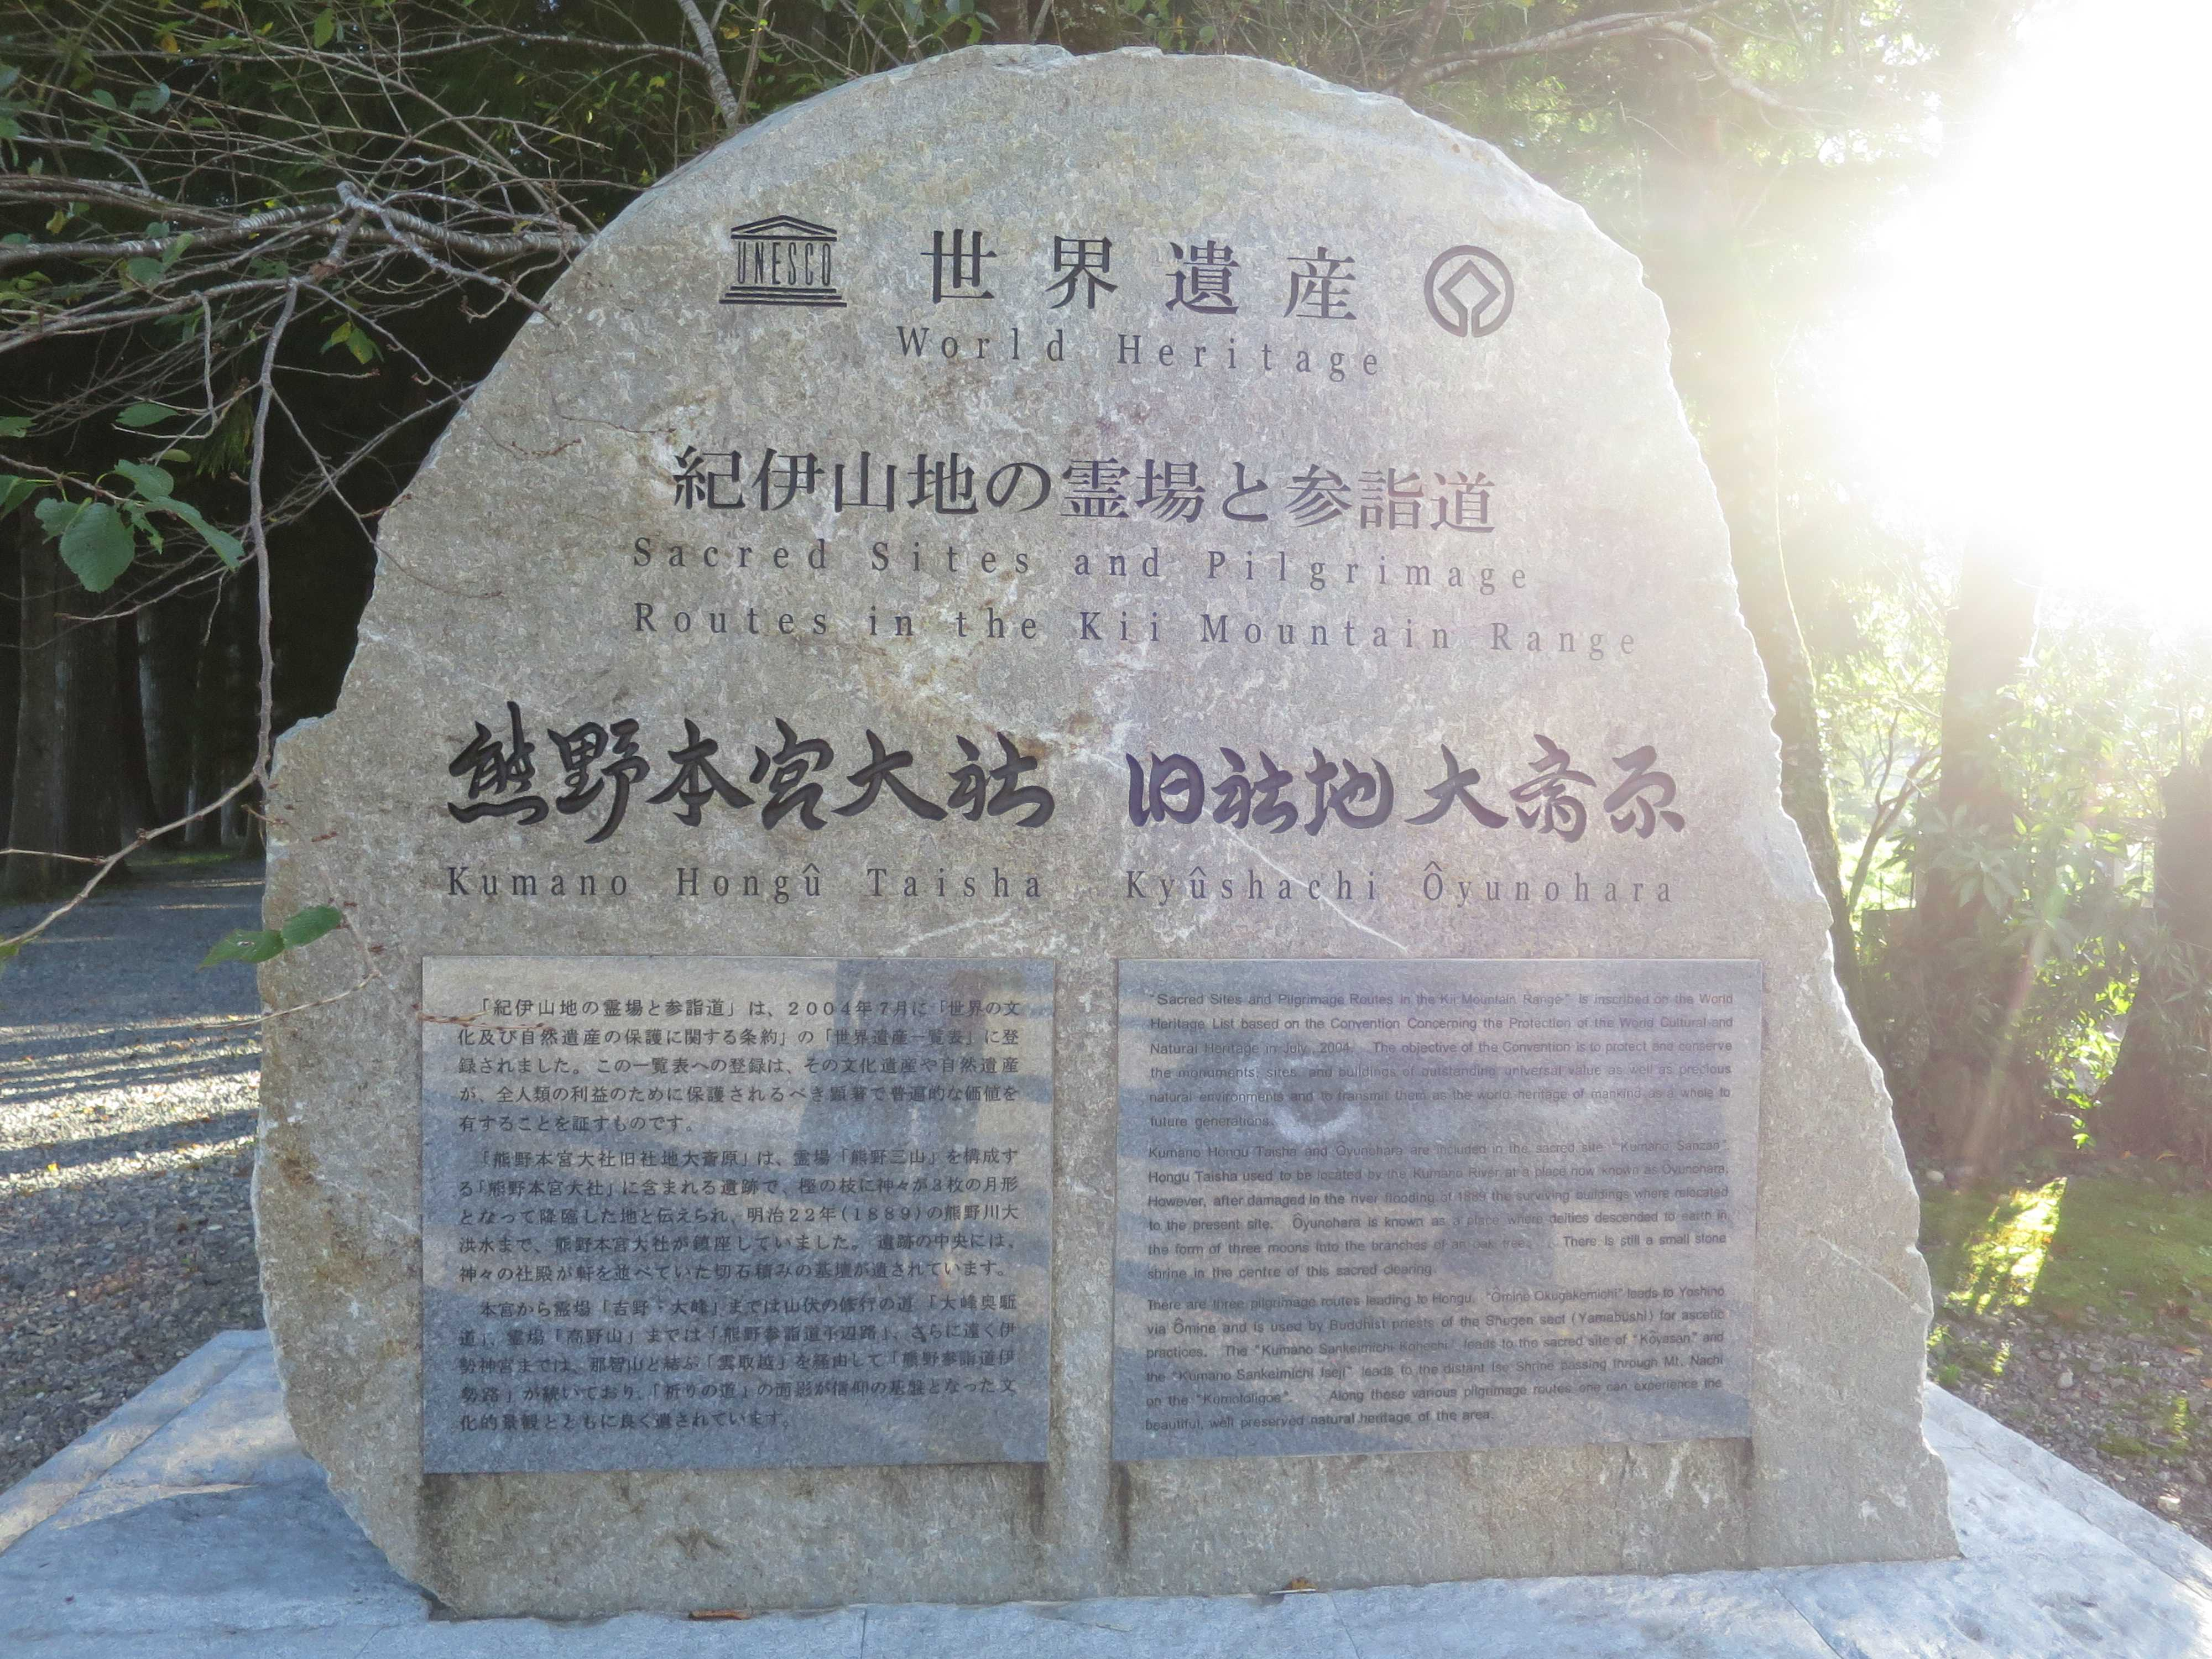 世界遺産 紀伊山地の霊場と参詣道